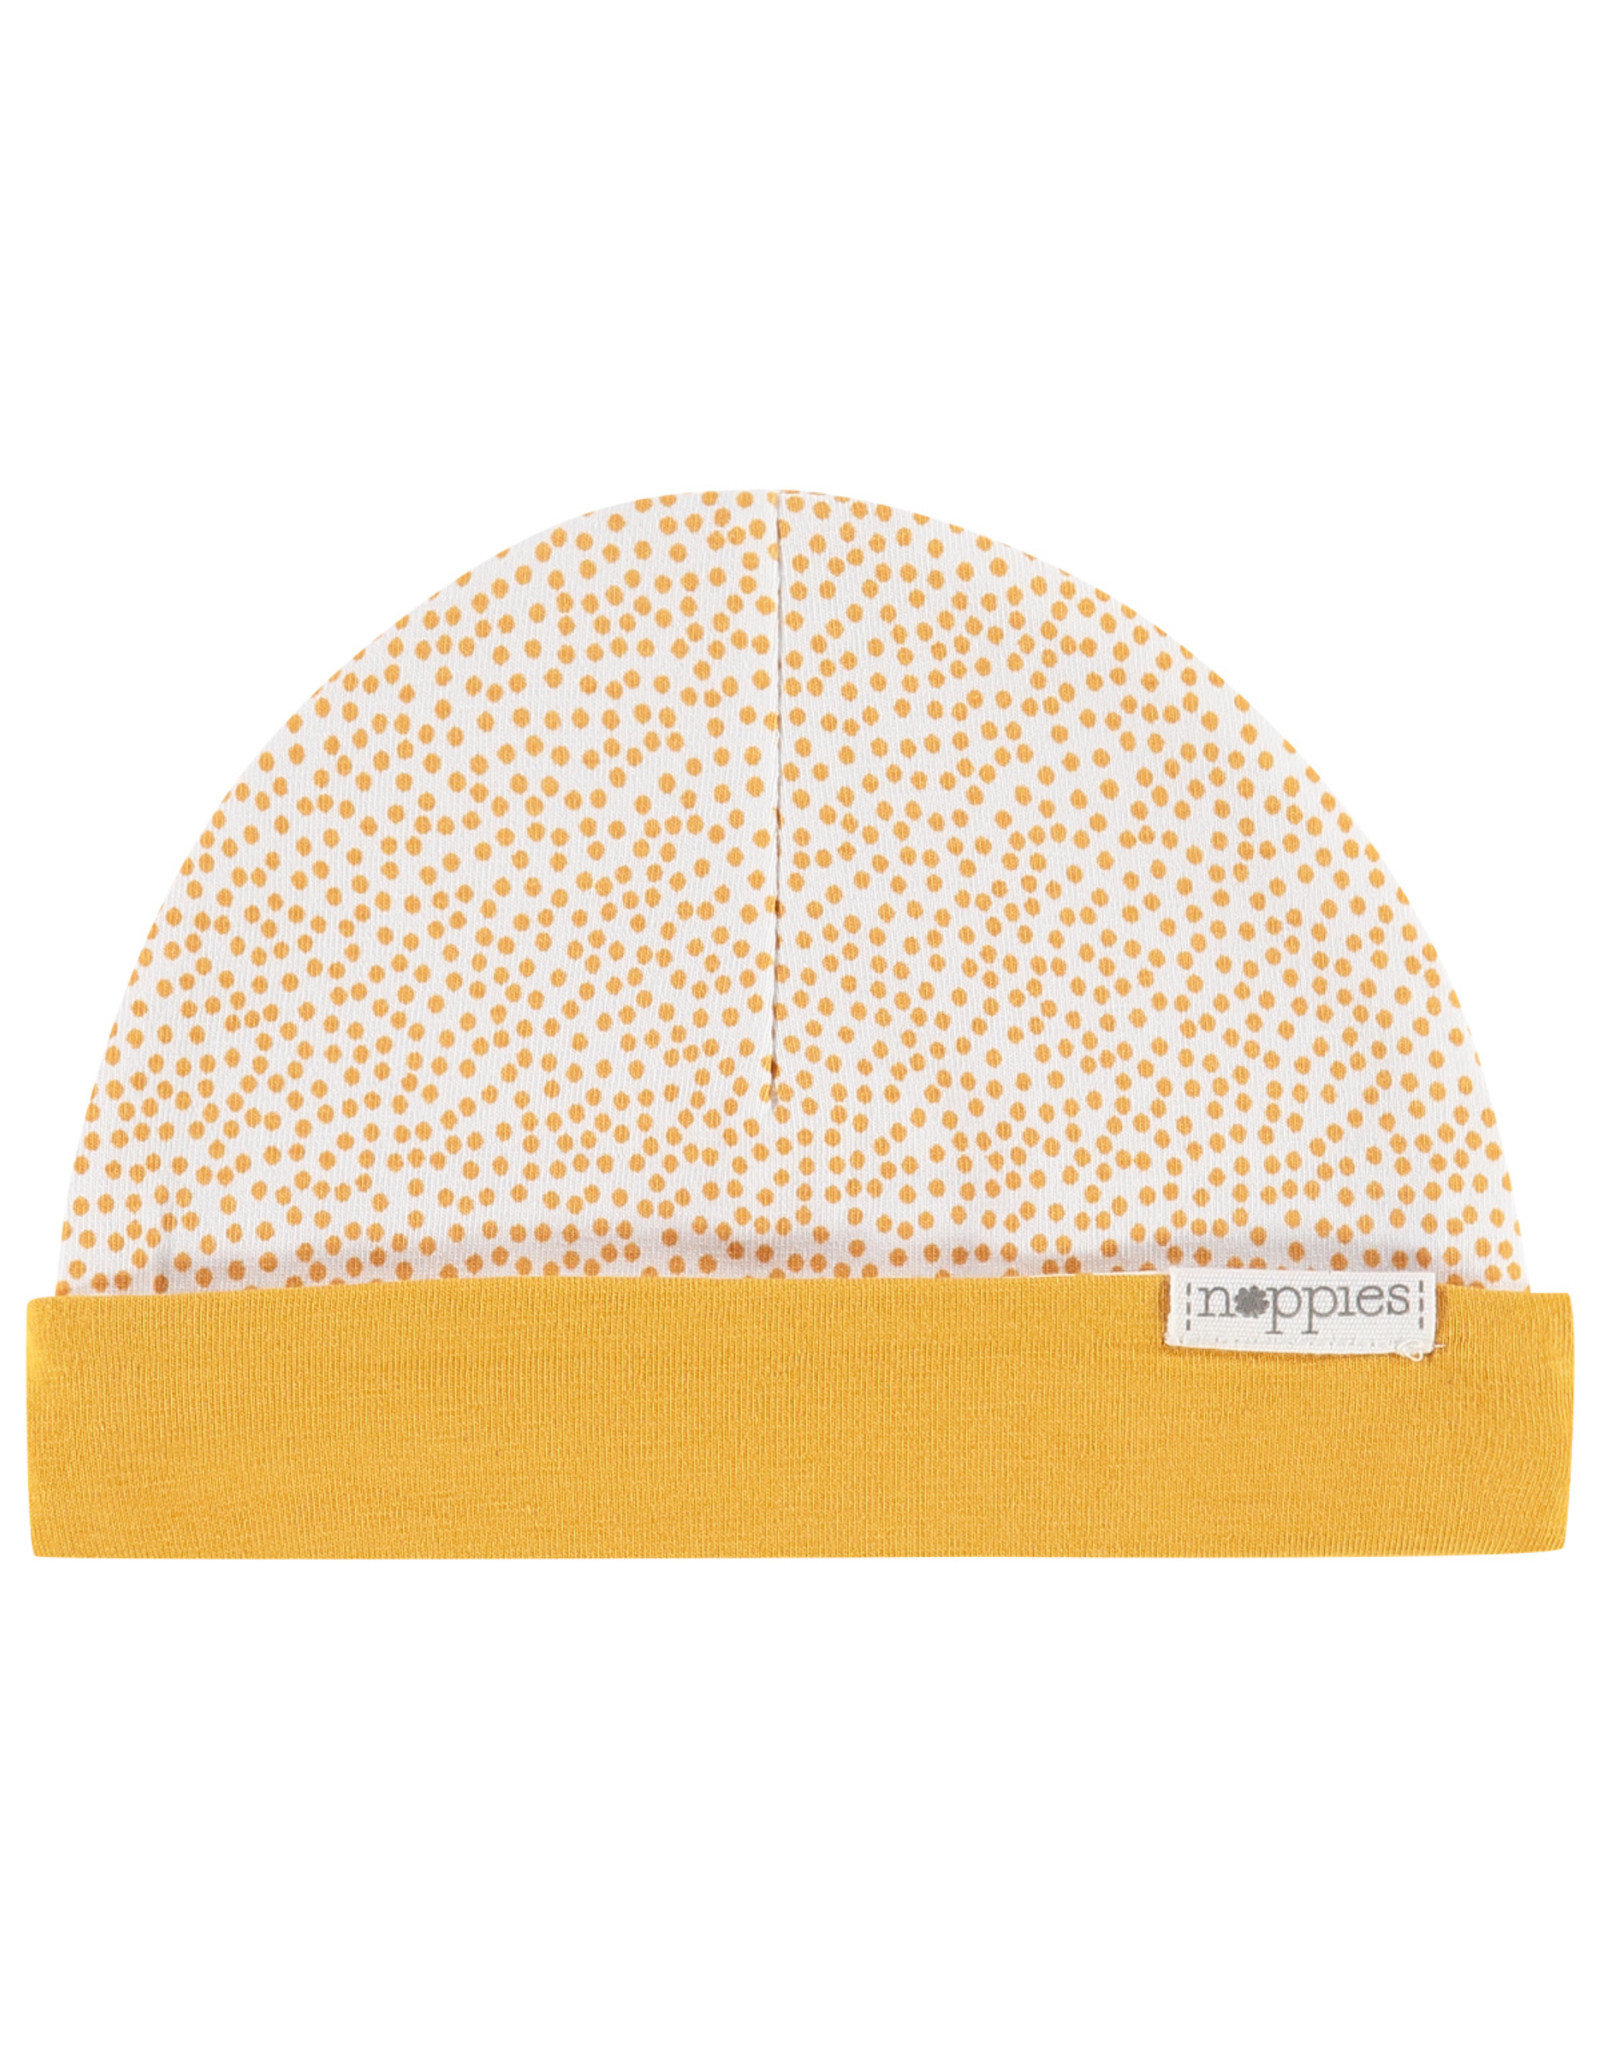 Noppies U Hat rev Babylon honey yellow